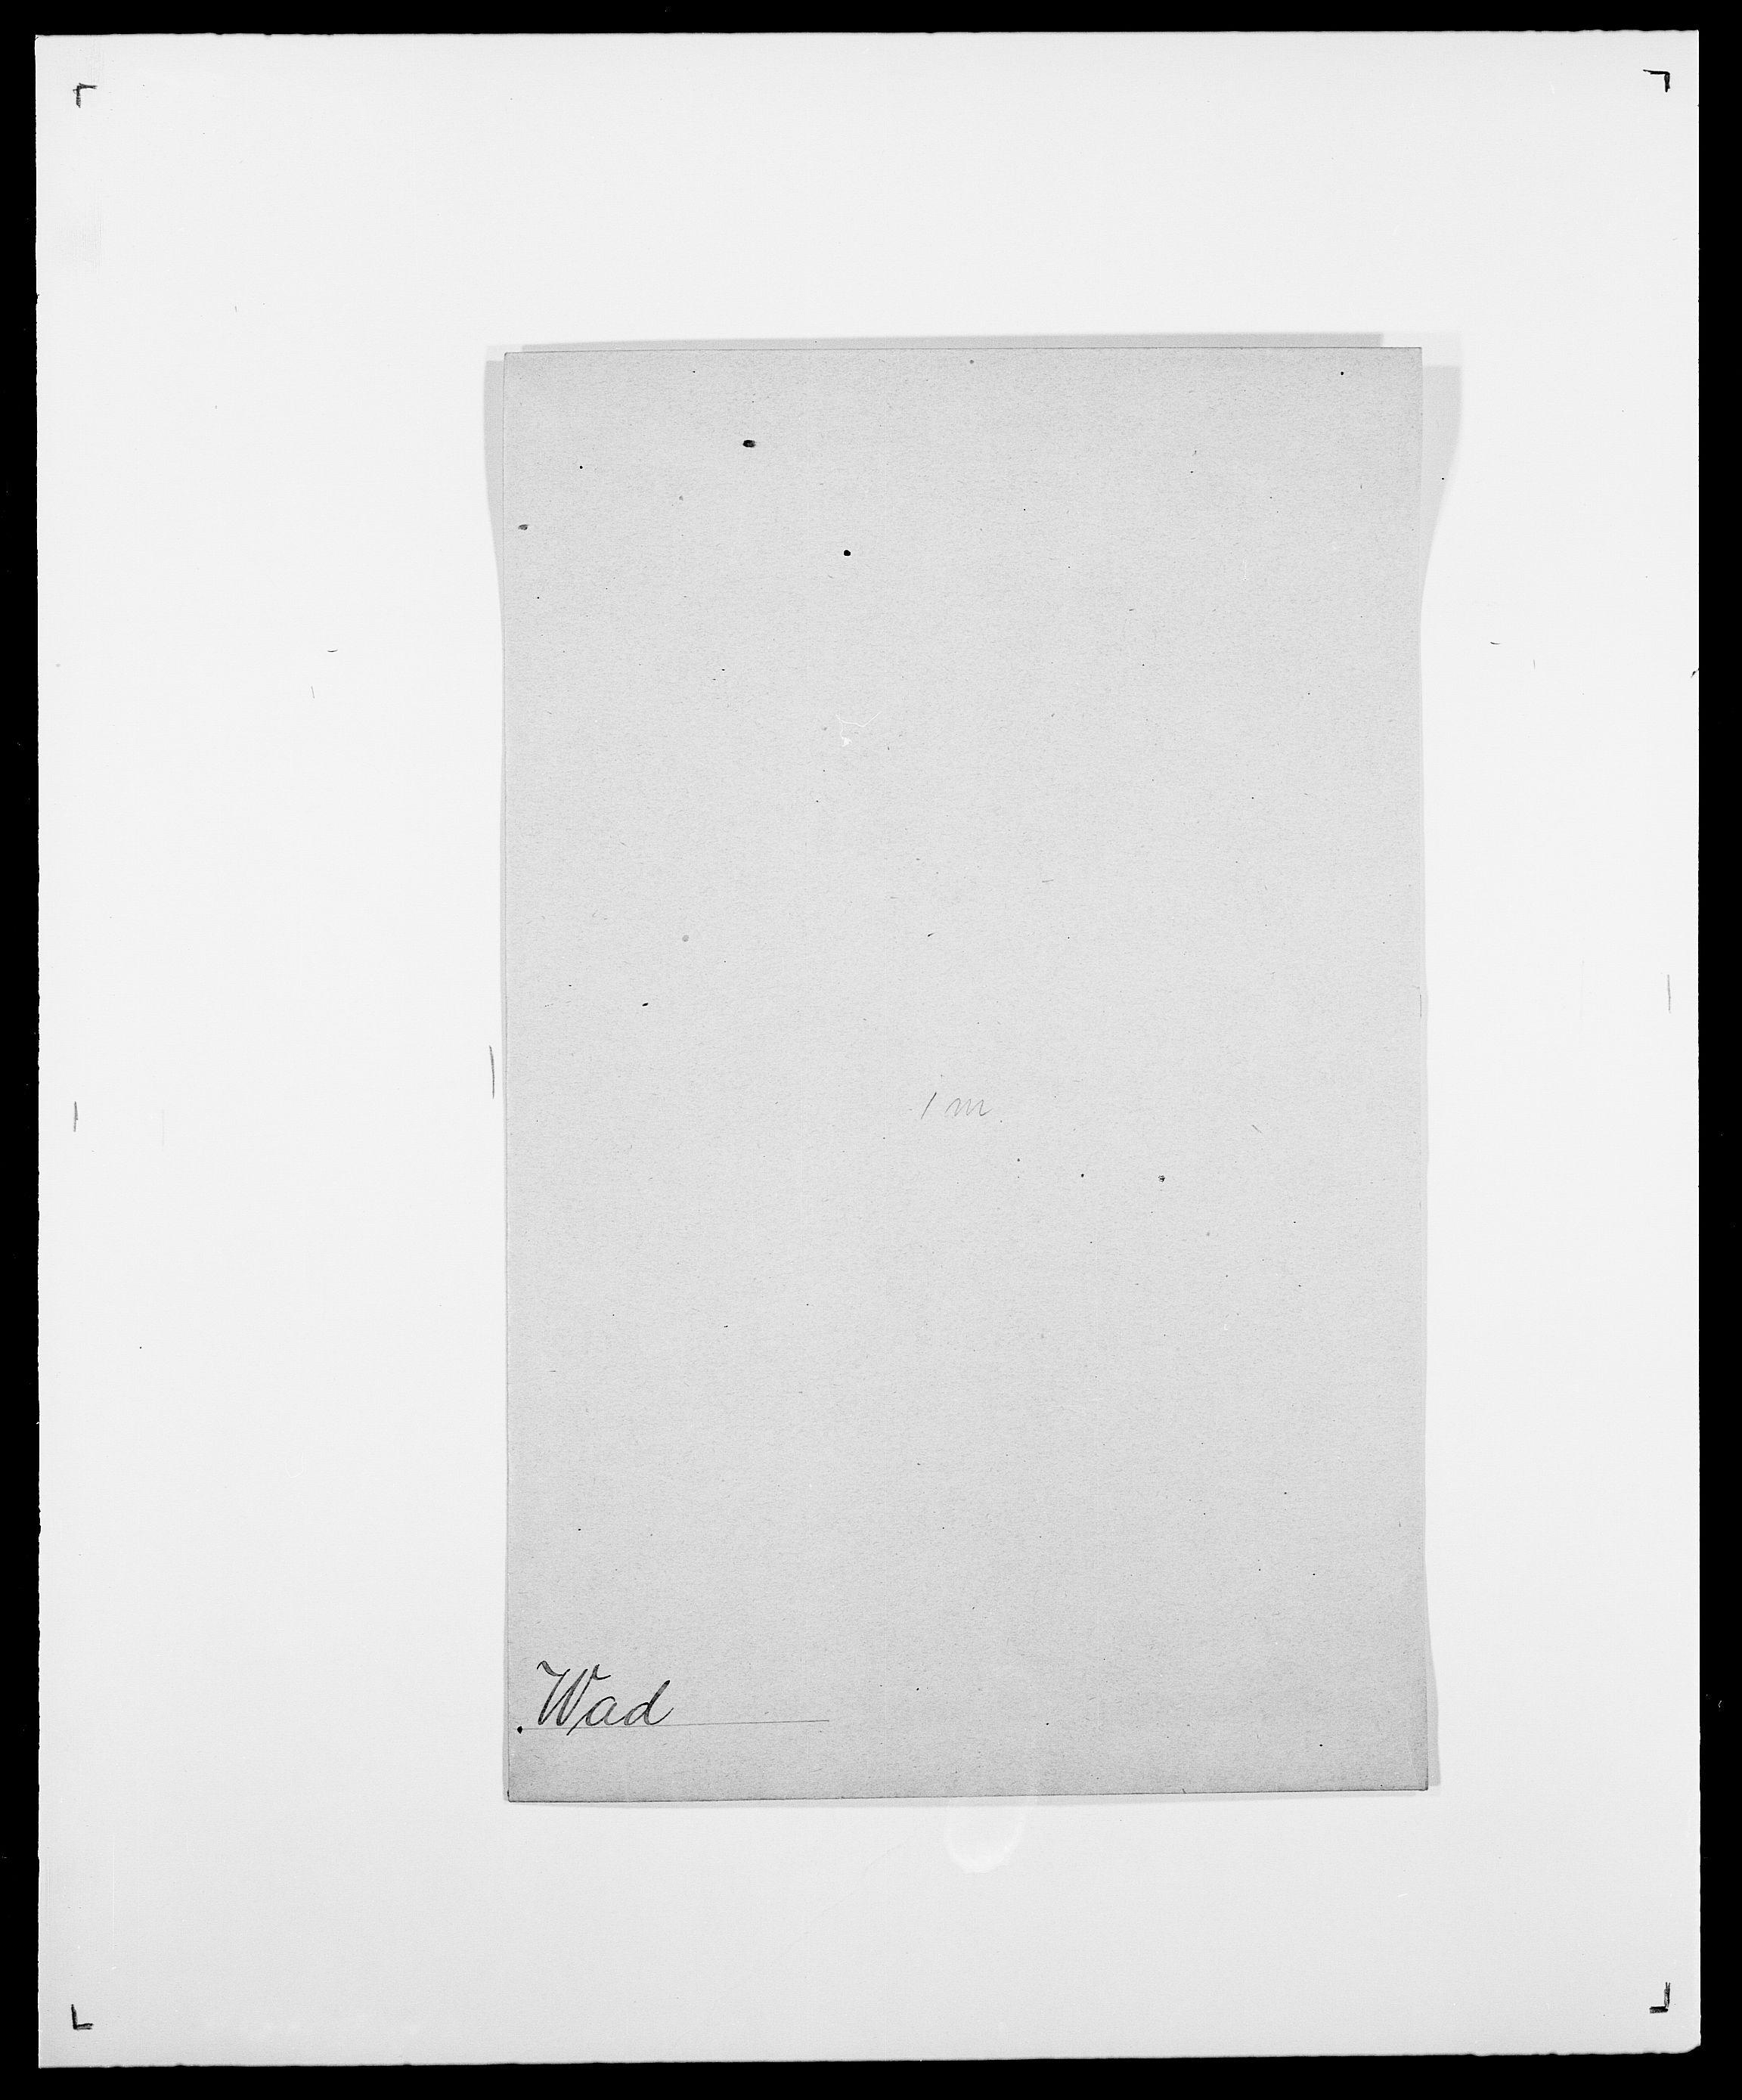 SAO, Delgobe, Charles Antoine - samling, D/Da/L0040: Usgaard - Velund, s. 73